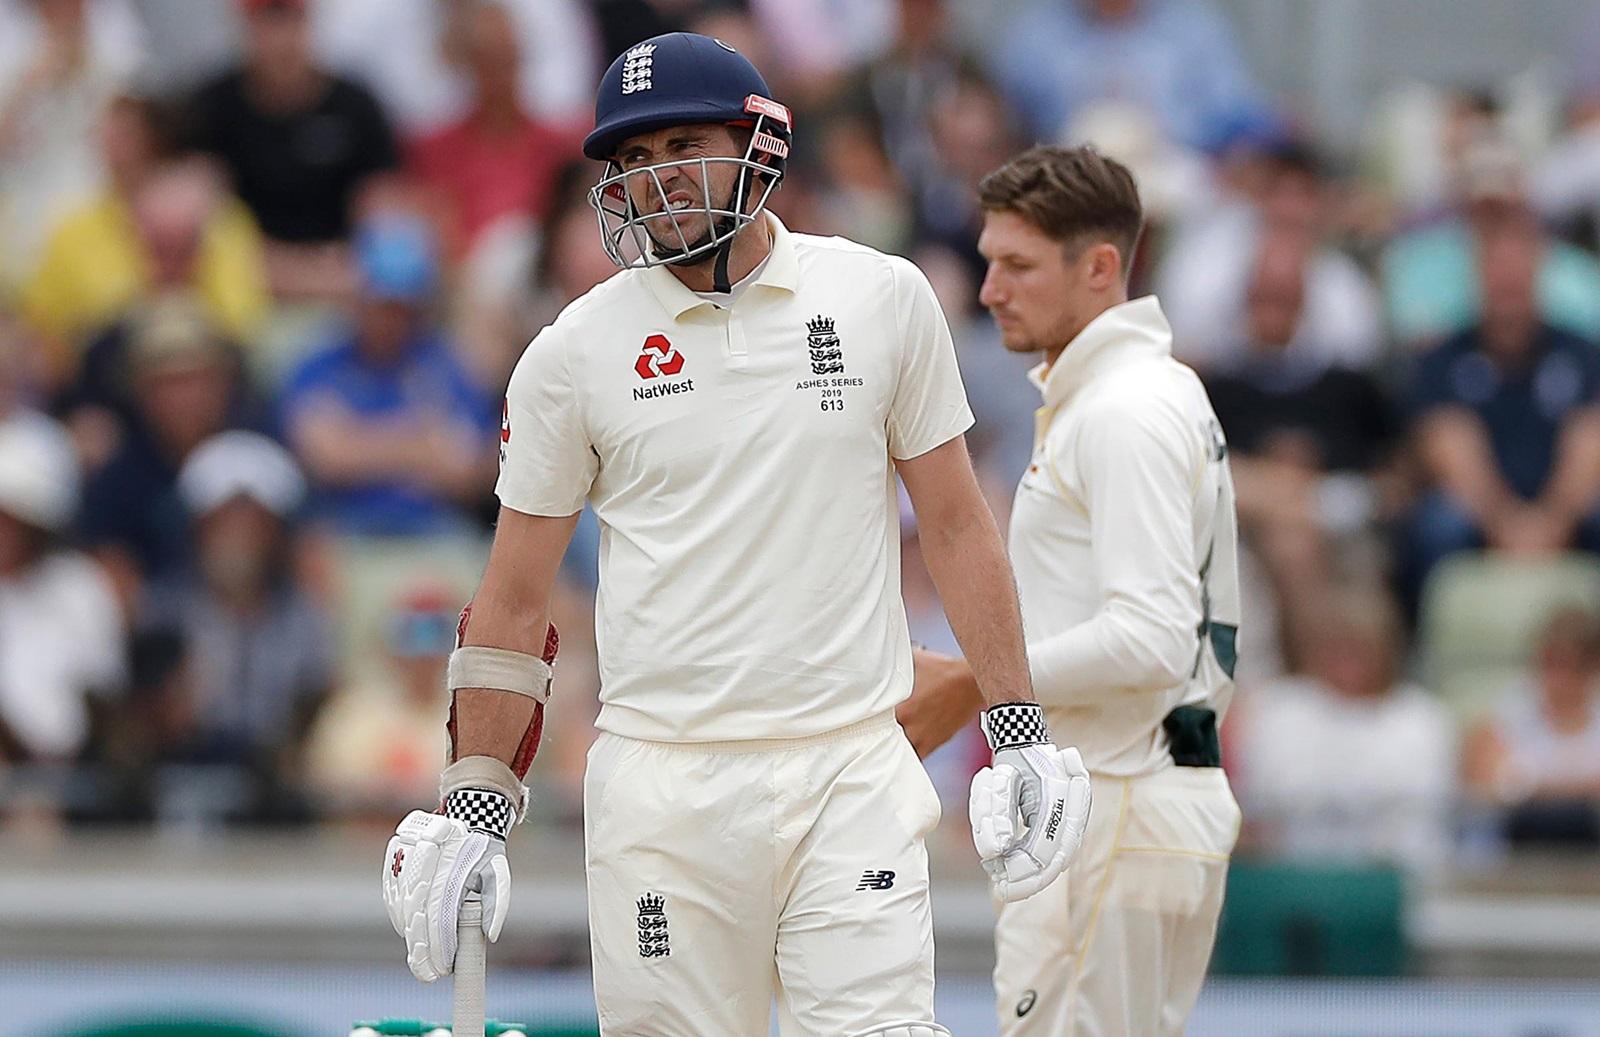 It's official: Anderson won't bowl again in Edgbaston Test   cricket.com.au